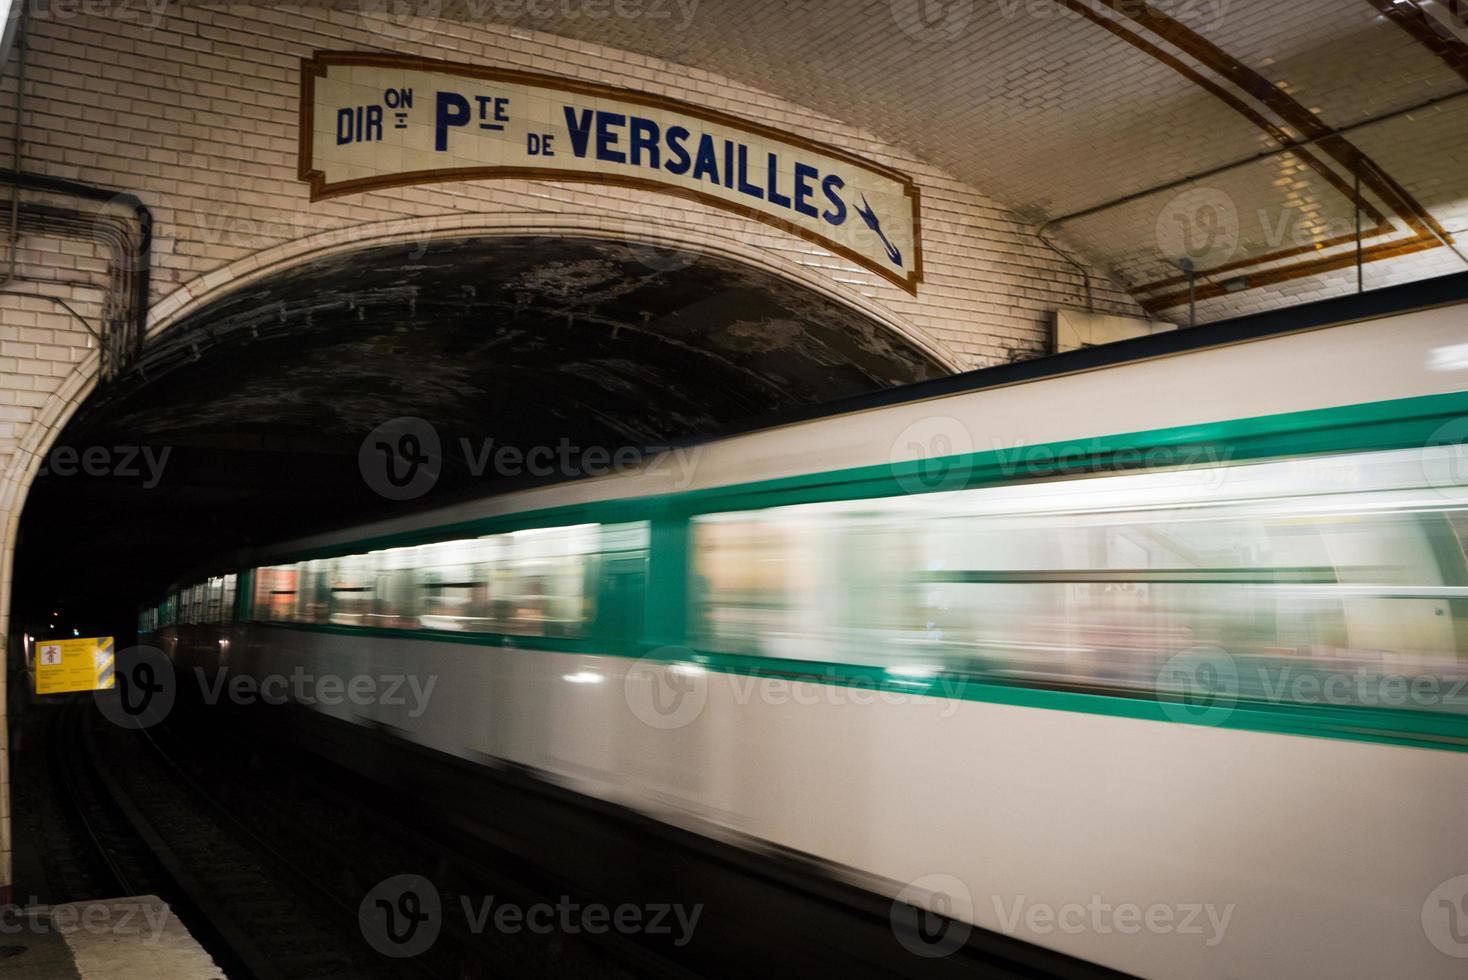 Parigi sotterranea, a PTE. de versailles stop foto